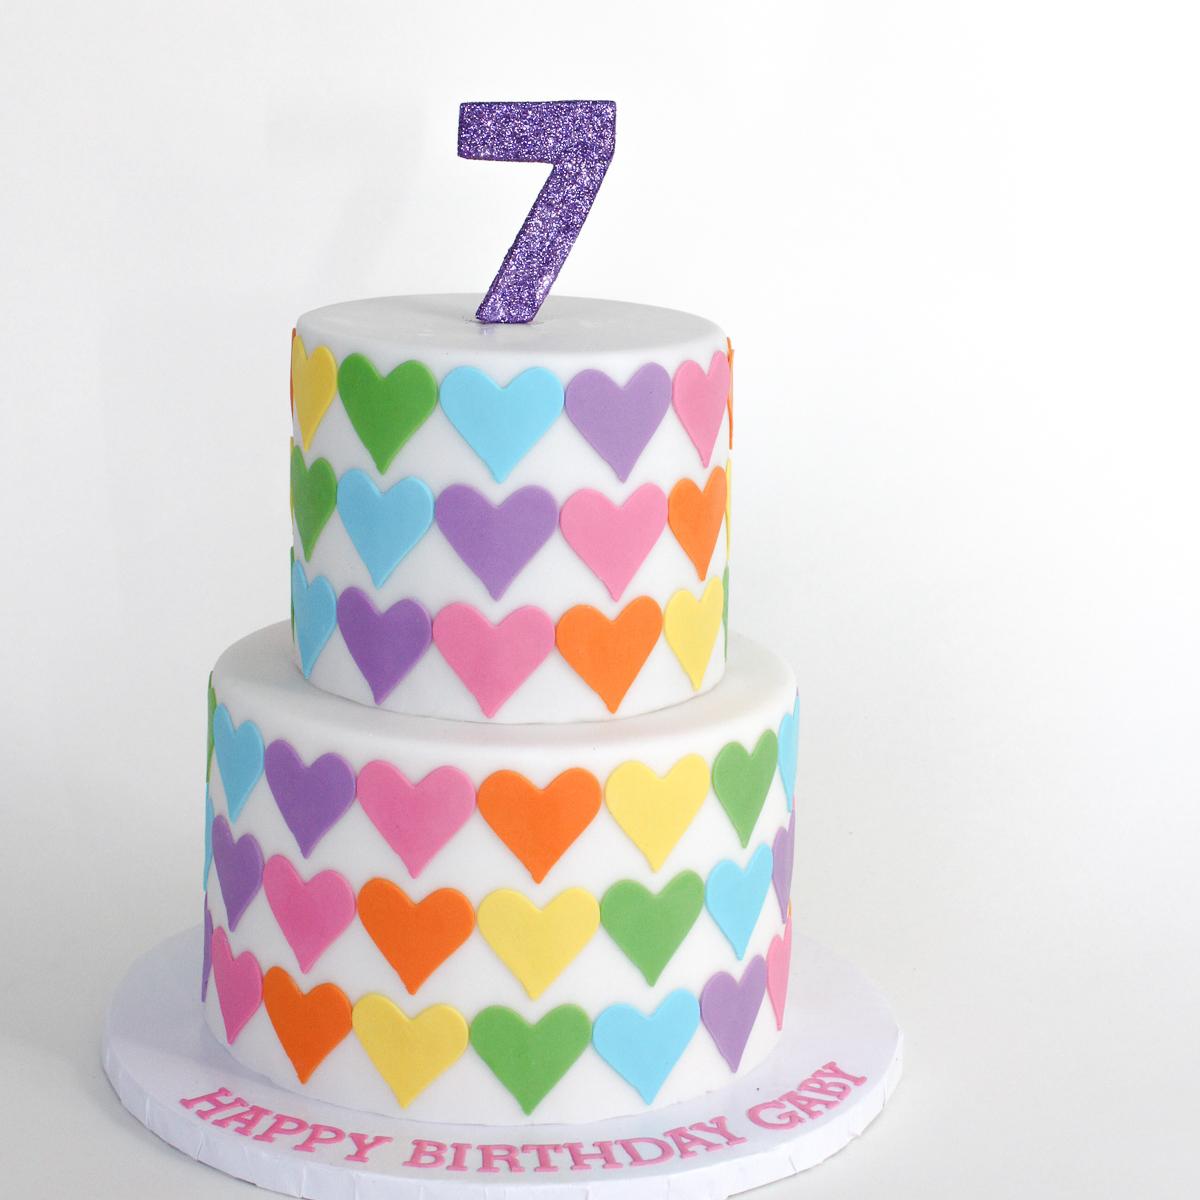 Rainbow Heart Cake_006-3.jpg